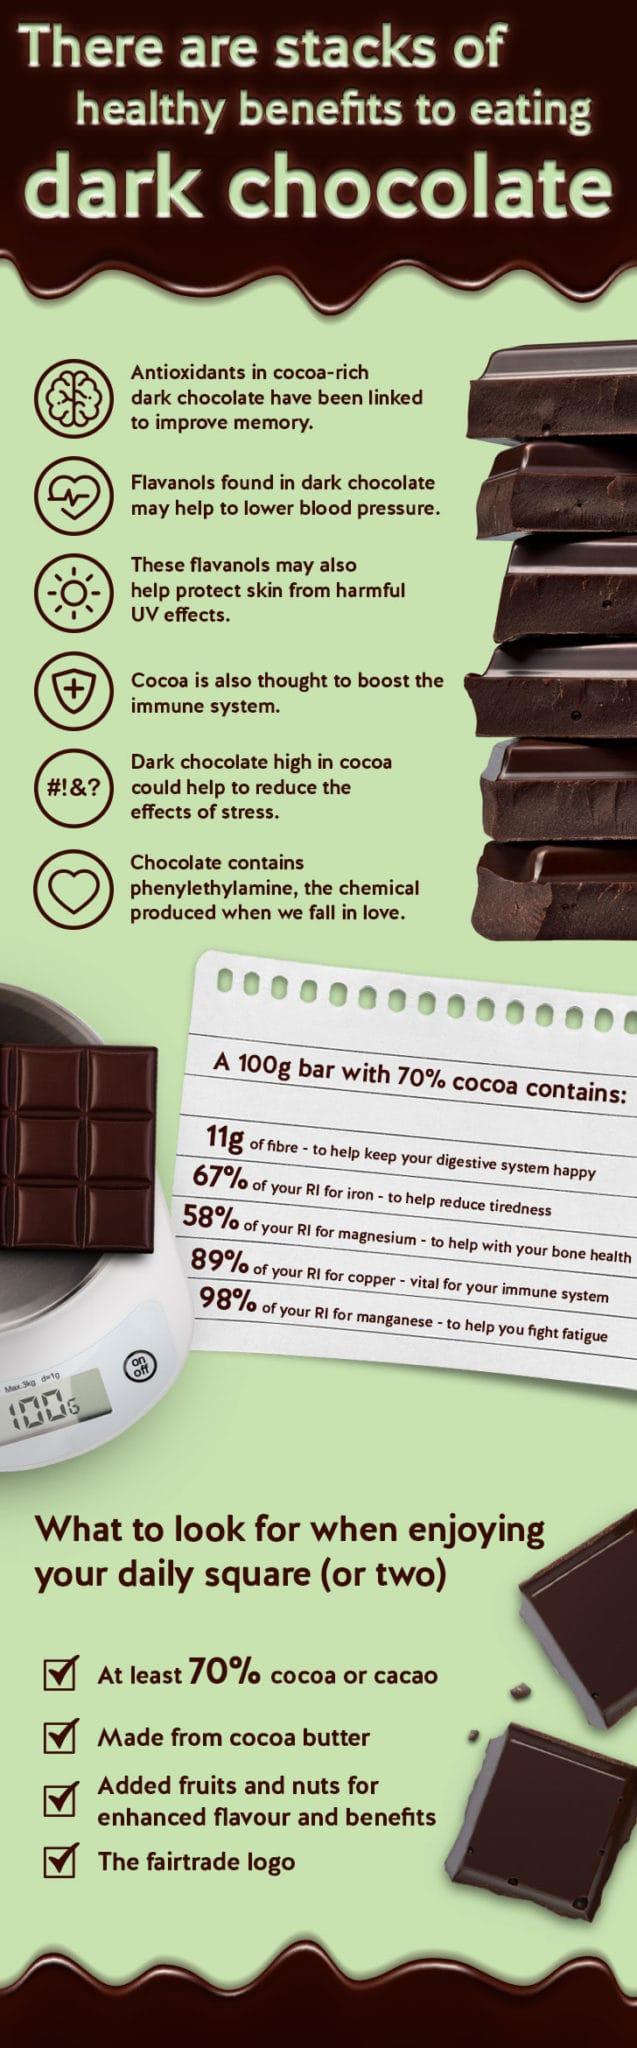 The benefits of eating dark chocolate